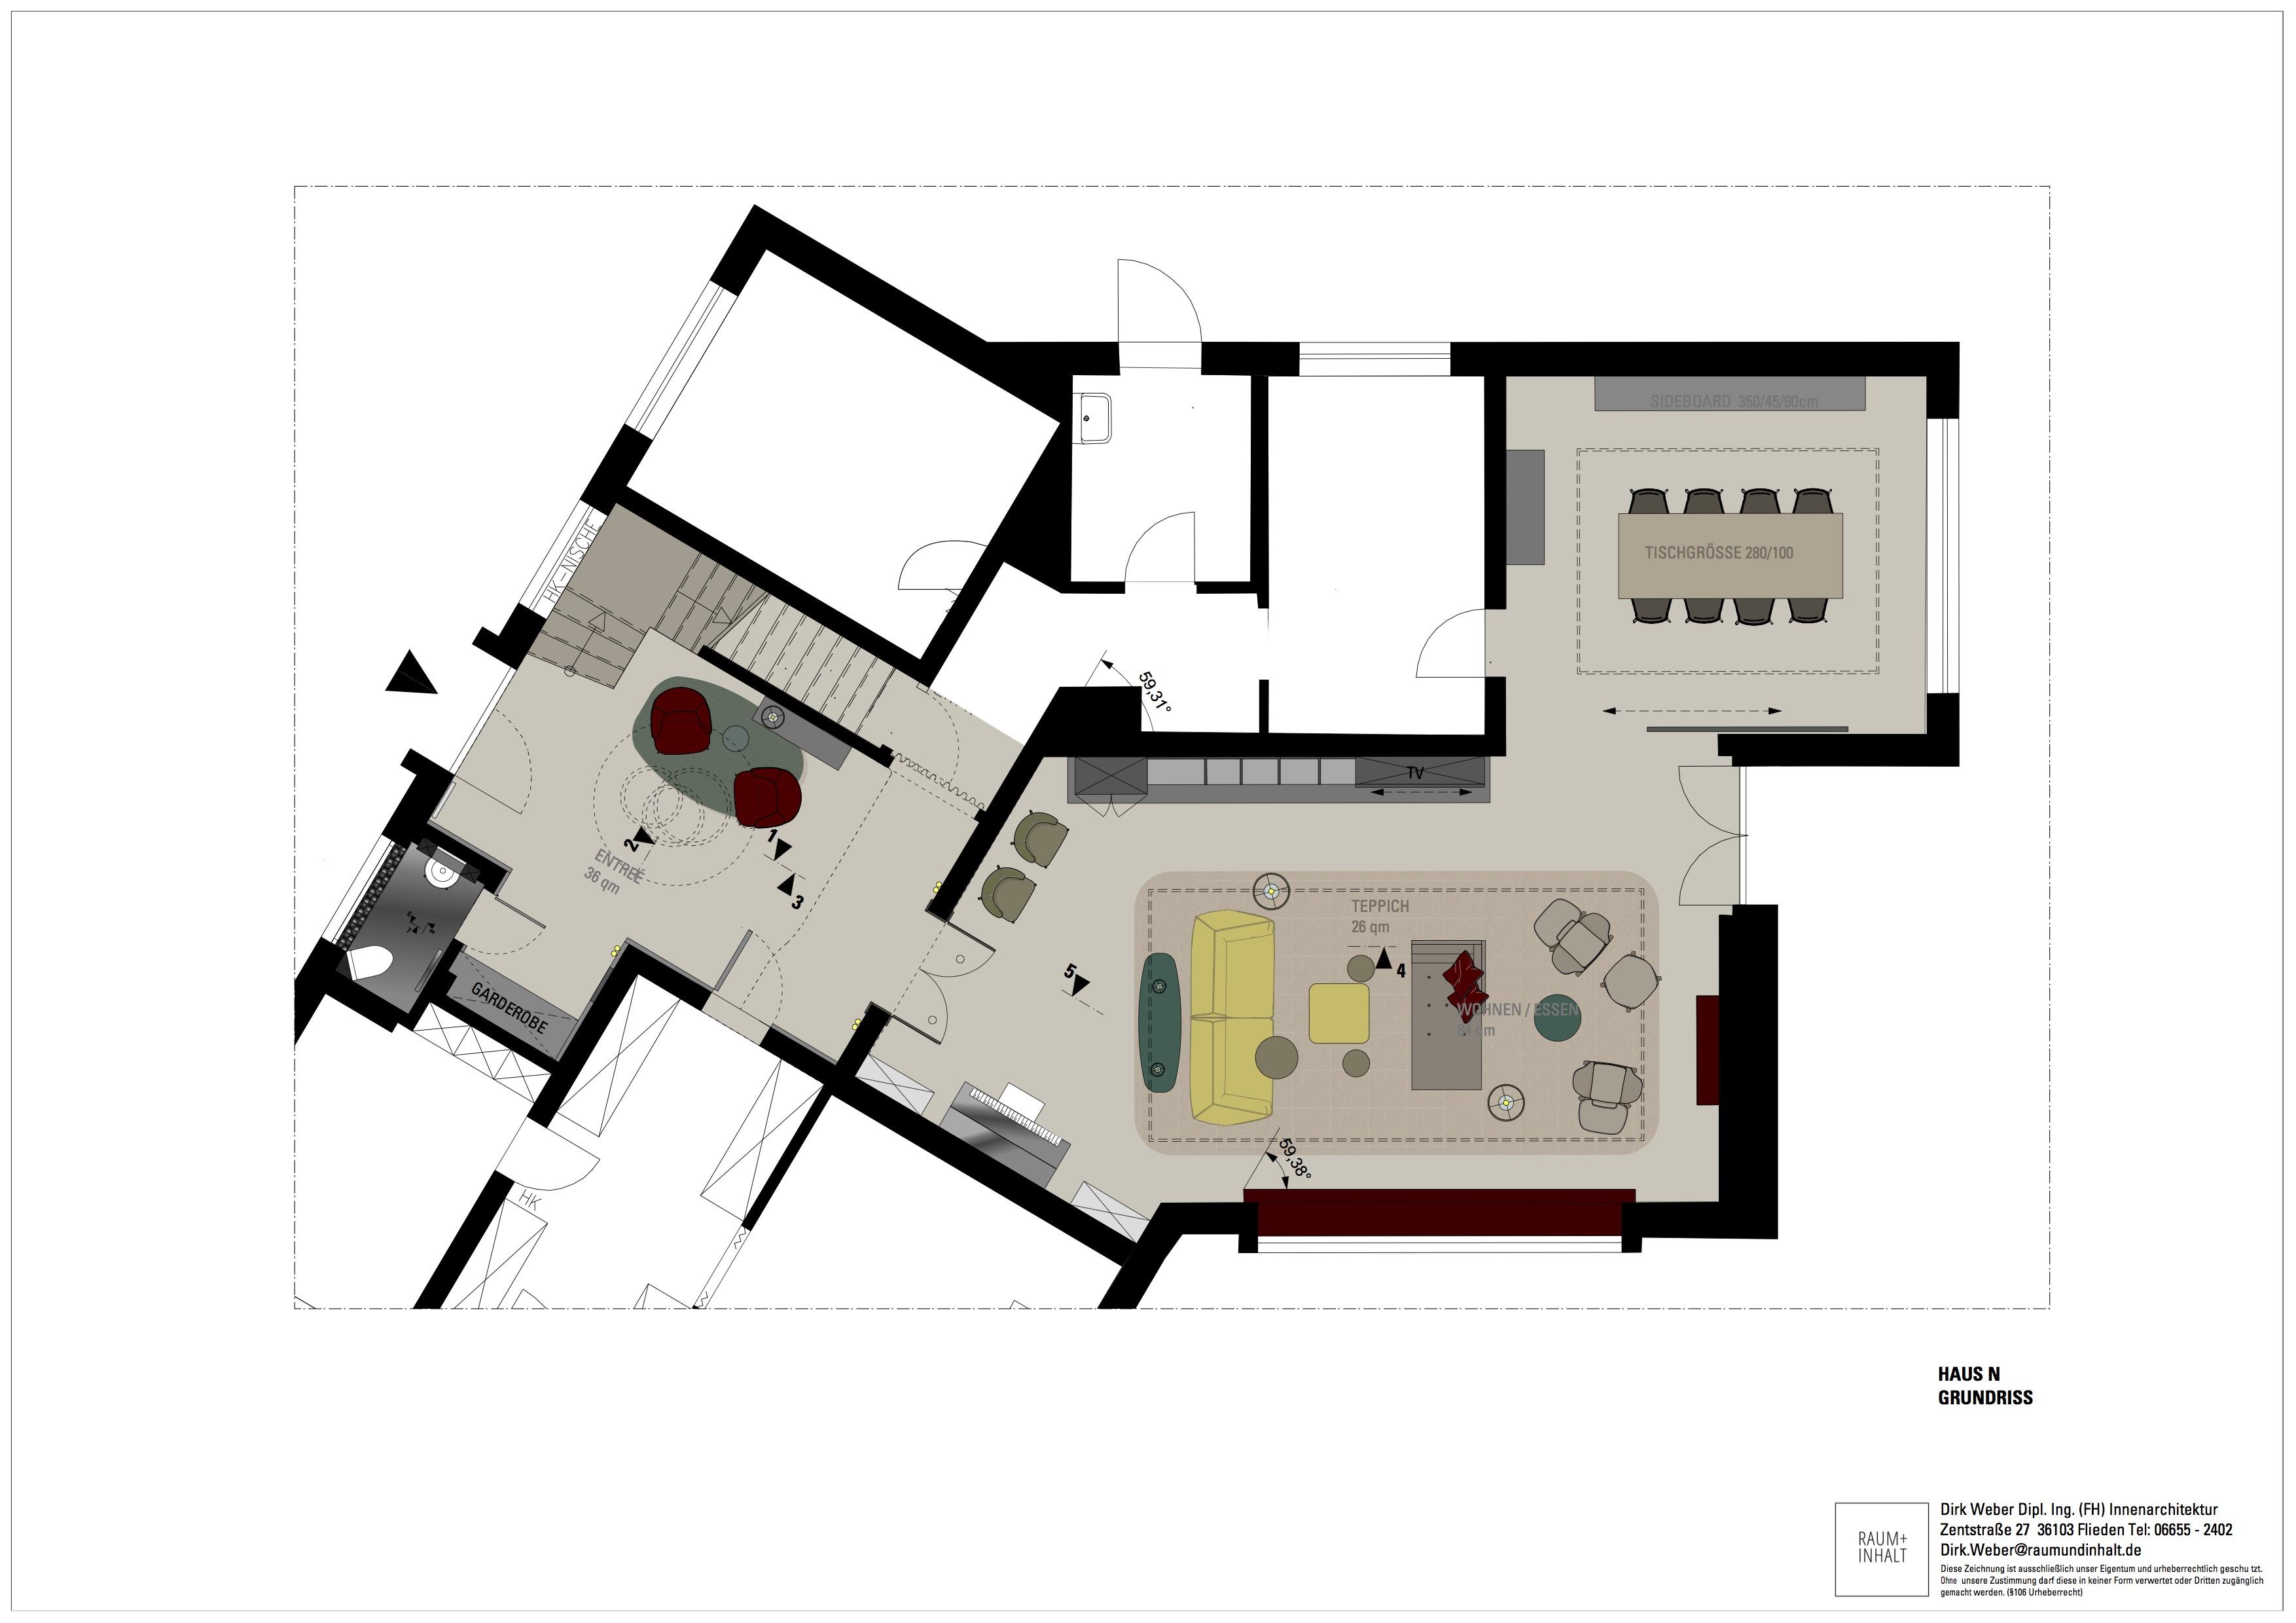 innenarchitektur fulda furthere info. Black Bedroom Furniture Sets. Home Design Ideas